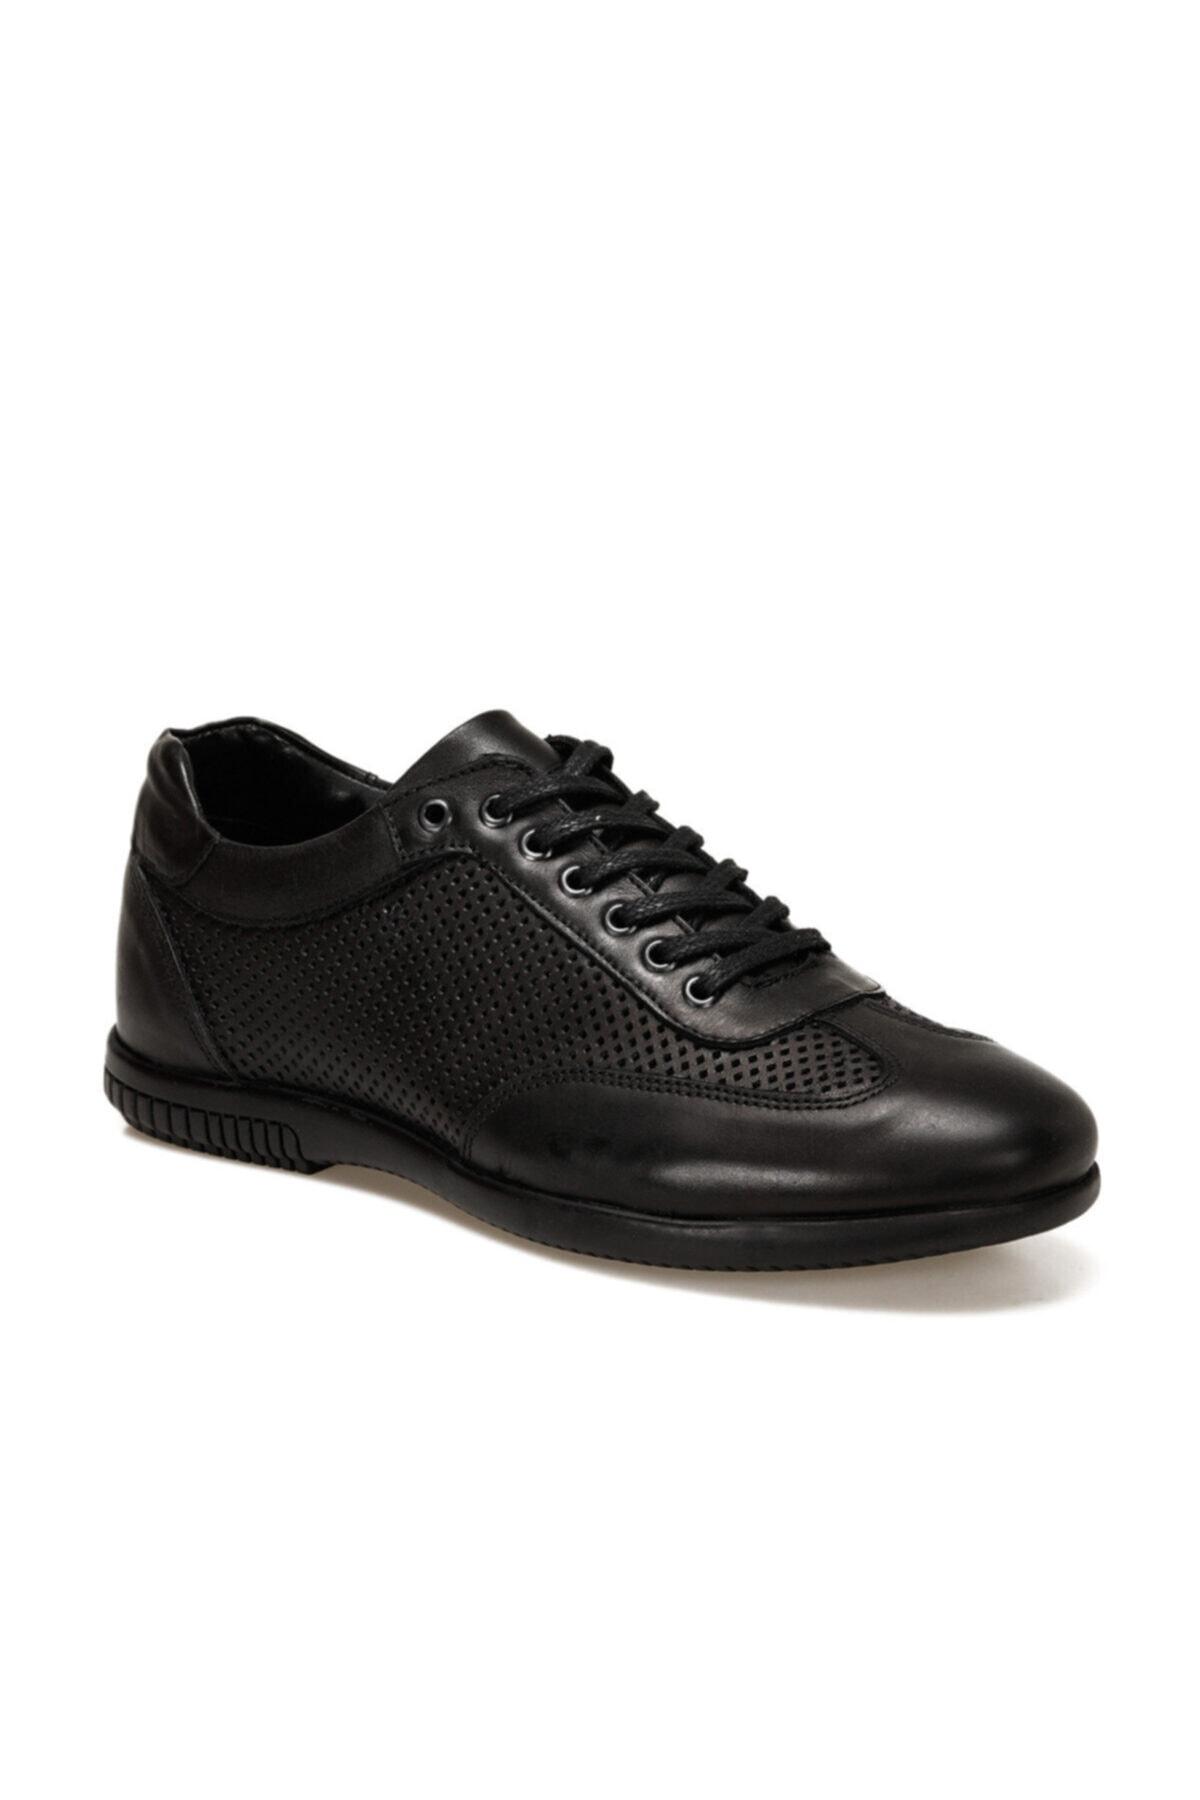 OXIDE Int1120y111 Siyah Erkek Ayakkabı 1